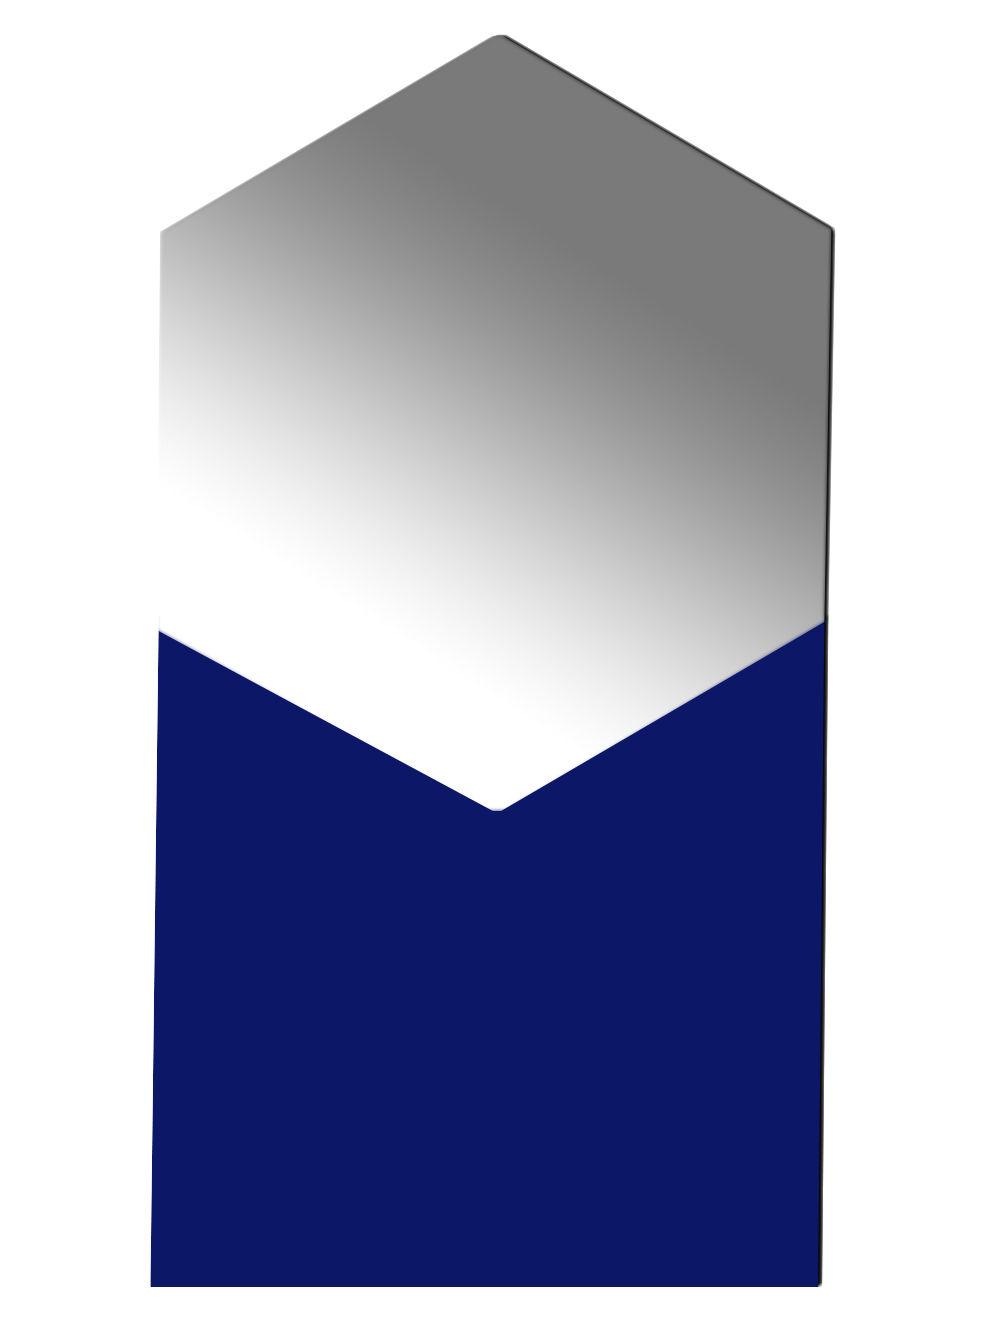 miroir shape hexagonal small l 50 x h 93 cm bleu d 39 eau h 93 cm hay. Black Bedroom Furniture Sets. Home Design Ideas